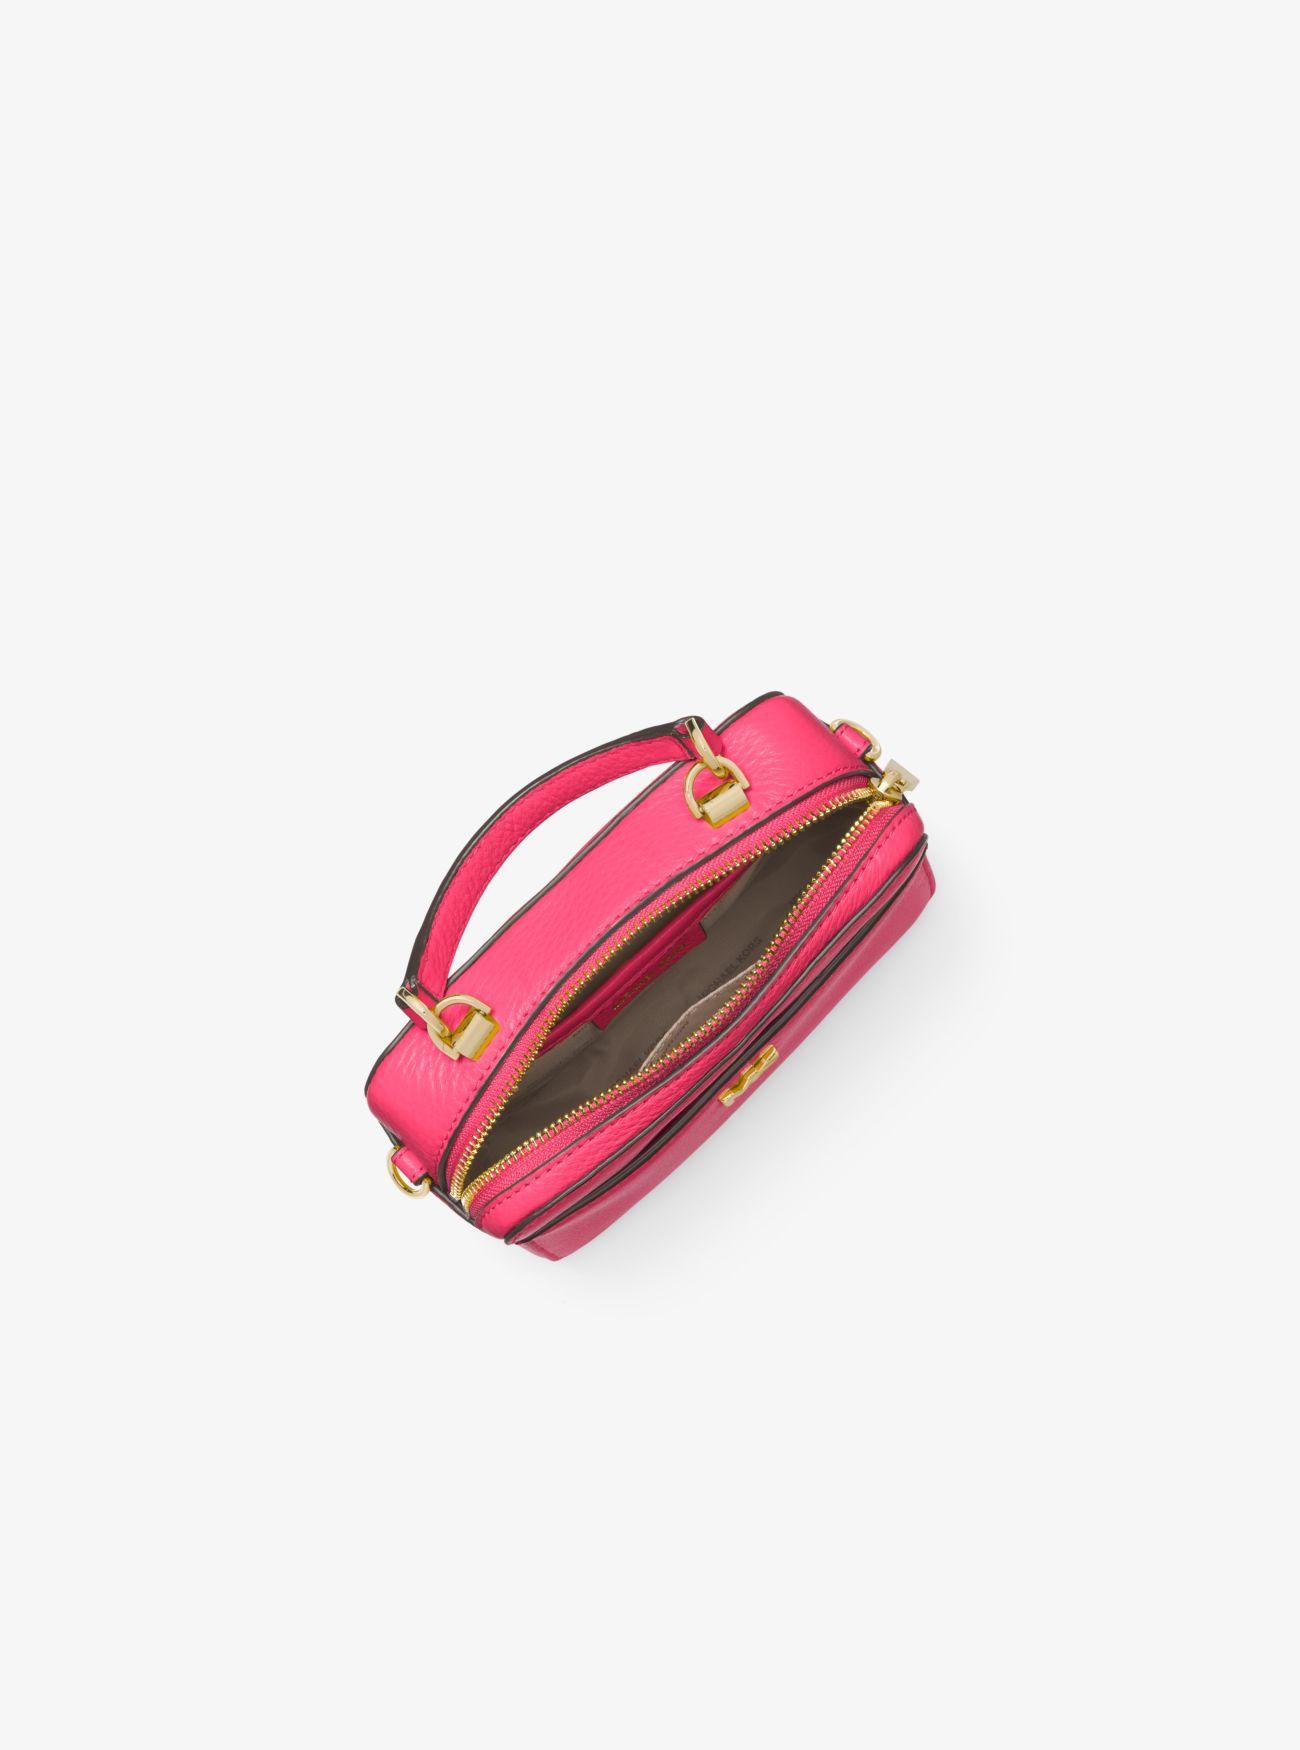 44706e02a192 Michael Kors Pink Mott Mini Pebbled Leather Crossbody